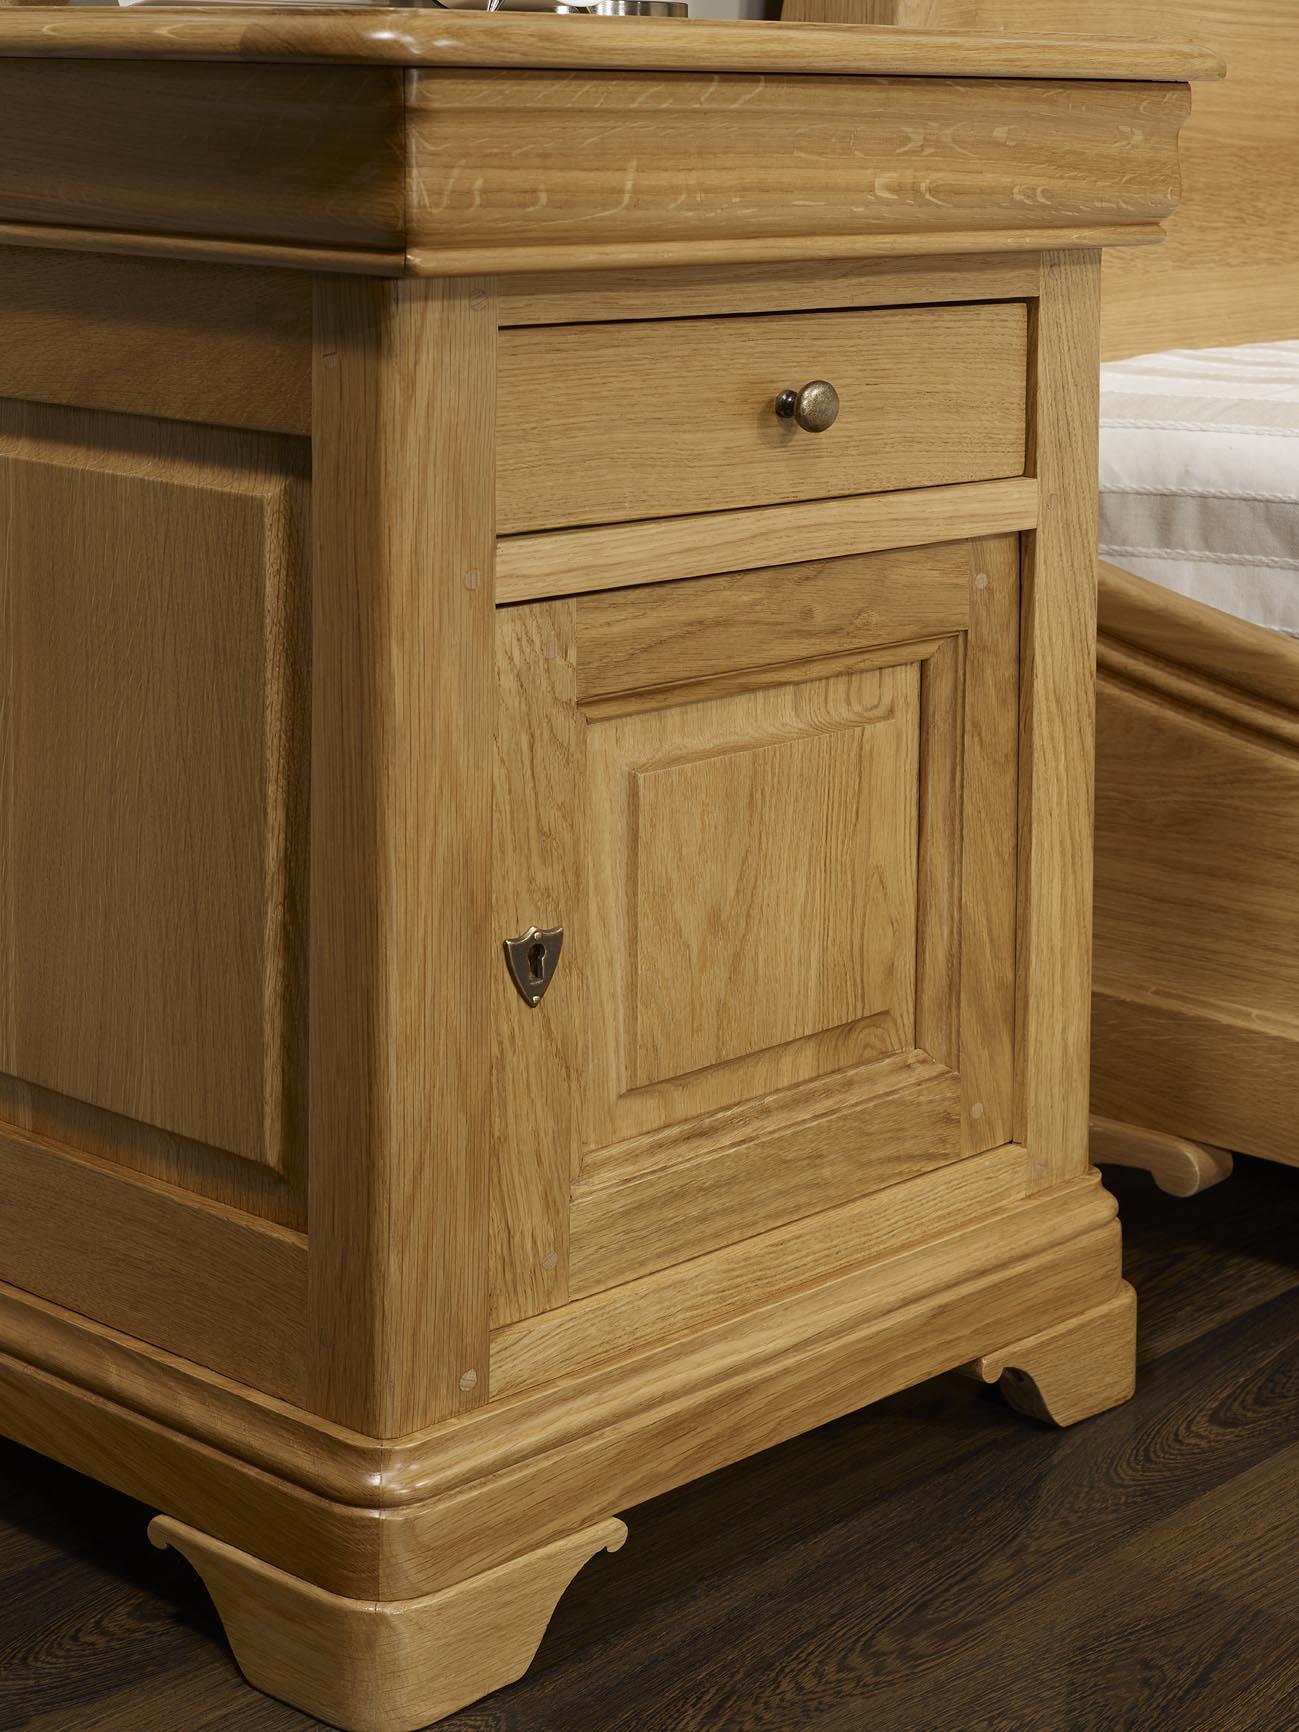 chevet 1 porte 2 tiroirs guillaume en ch ne massif de style louis philippe finition ch ne cir. Black Bedroom Furniture Sets. Home Design Ideas